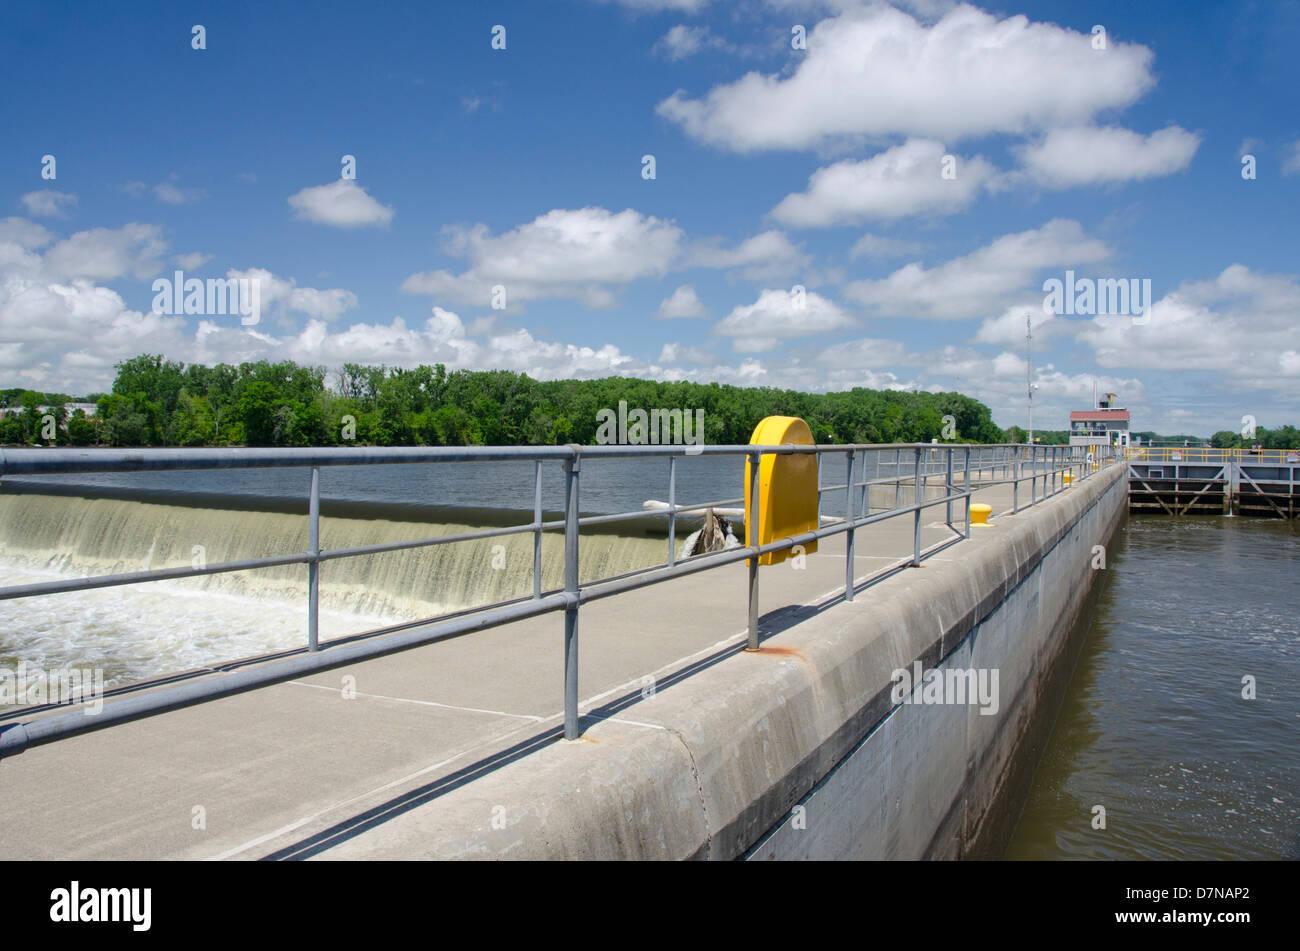 New York, Troy. Hudson River, Federal Lock. Stock Photo